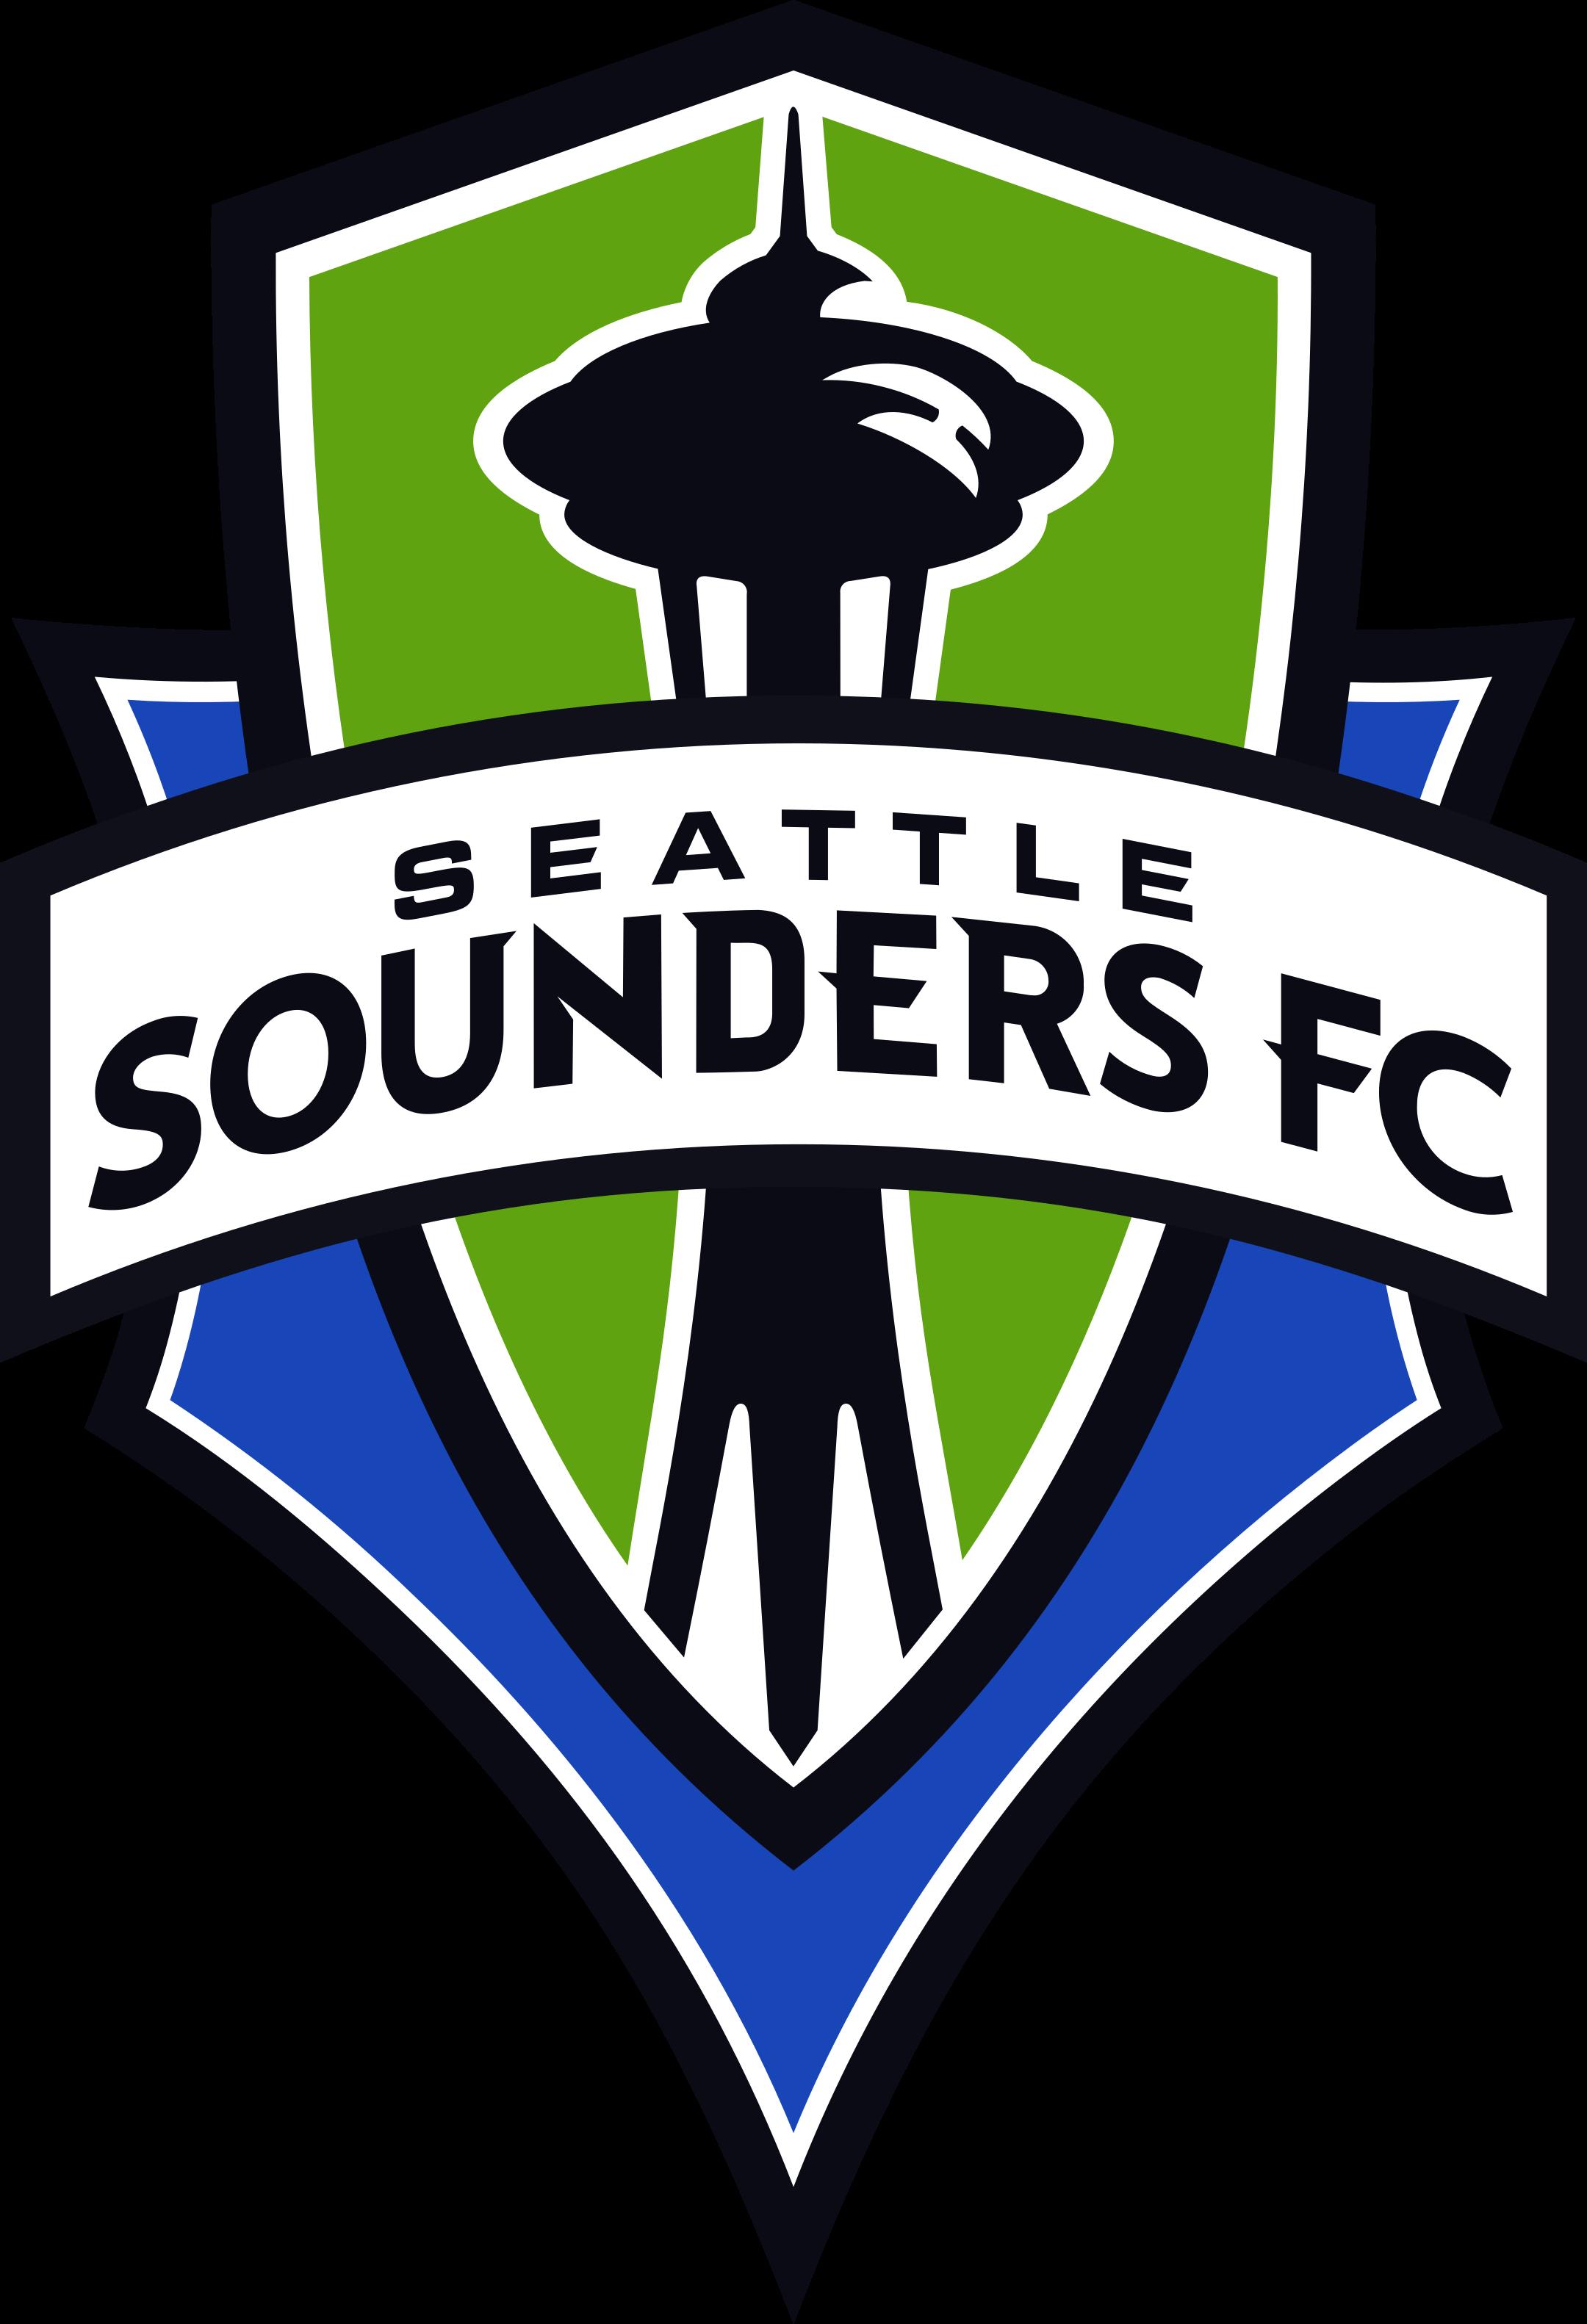 seattle sounders fc logo 1 - Seattle Sounders FC Logo